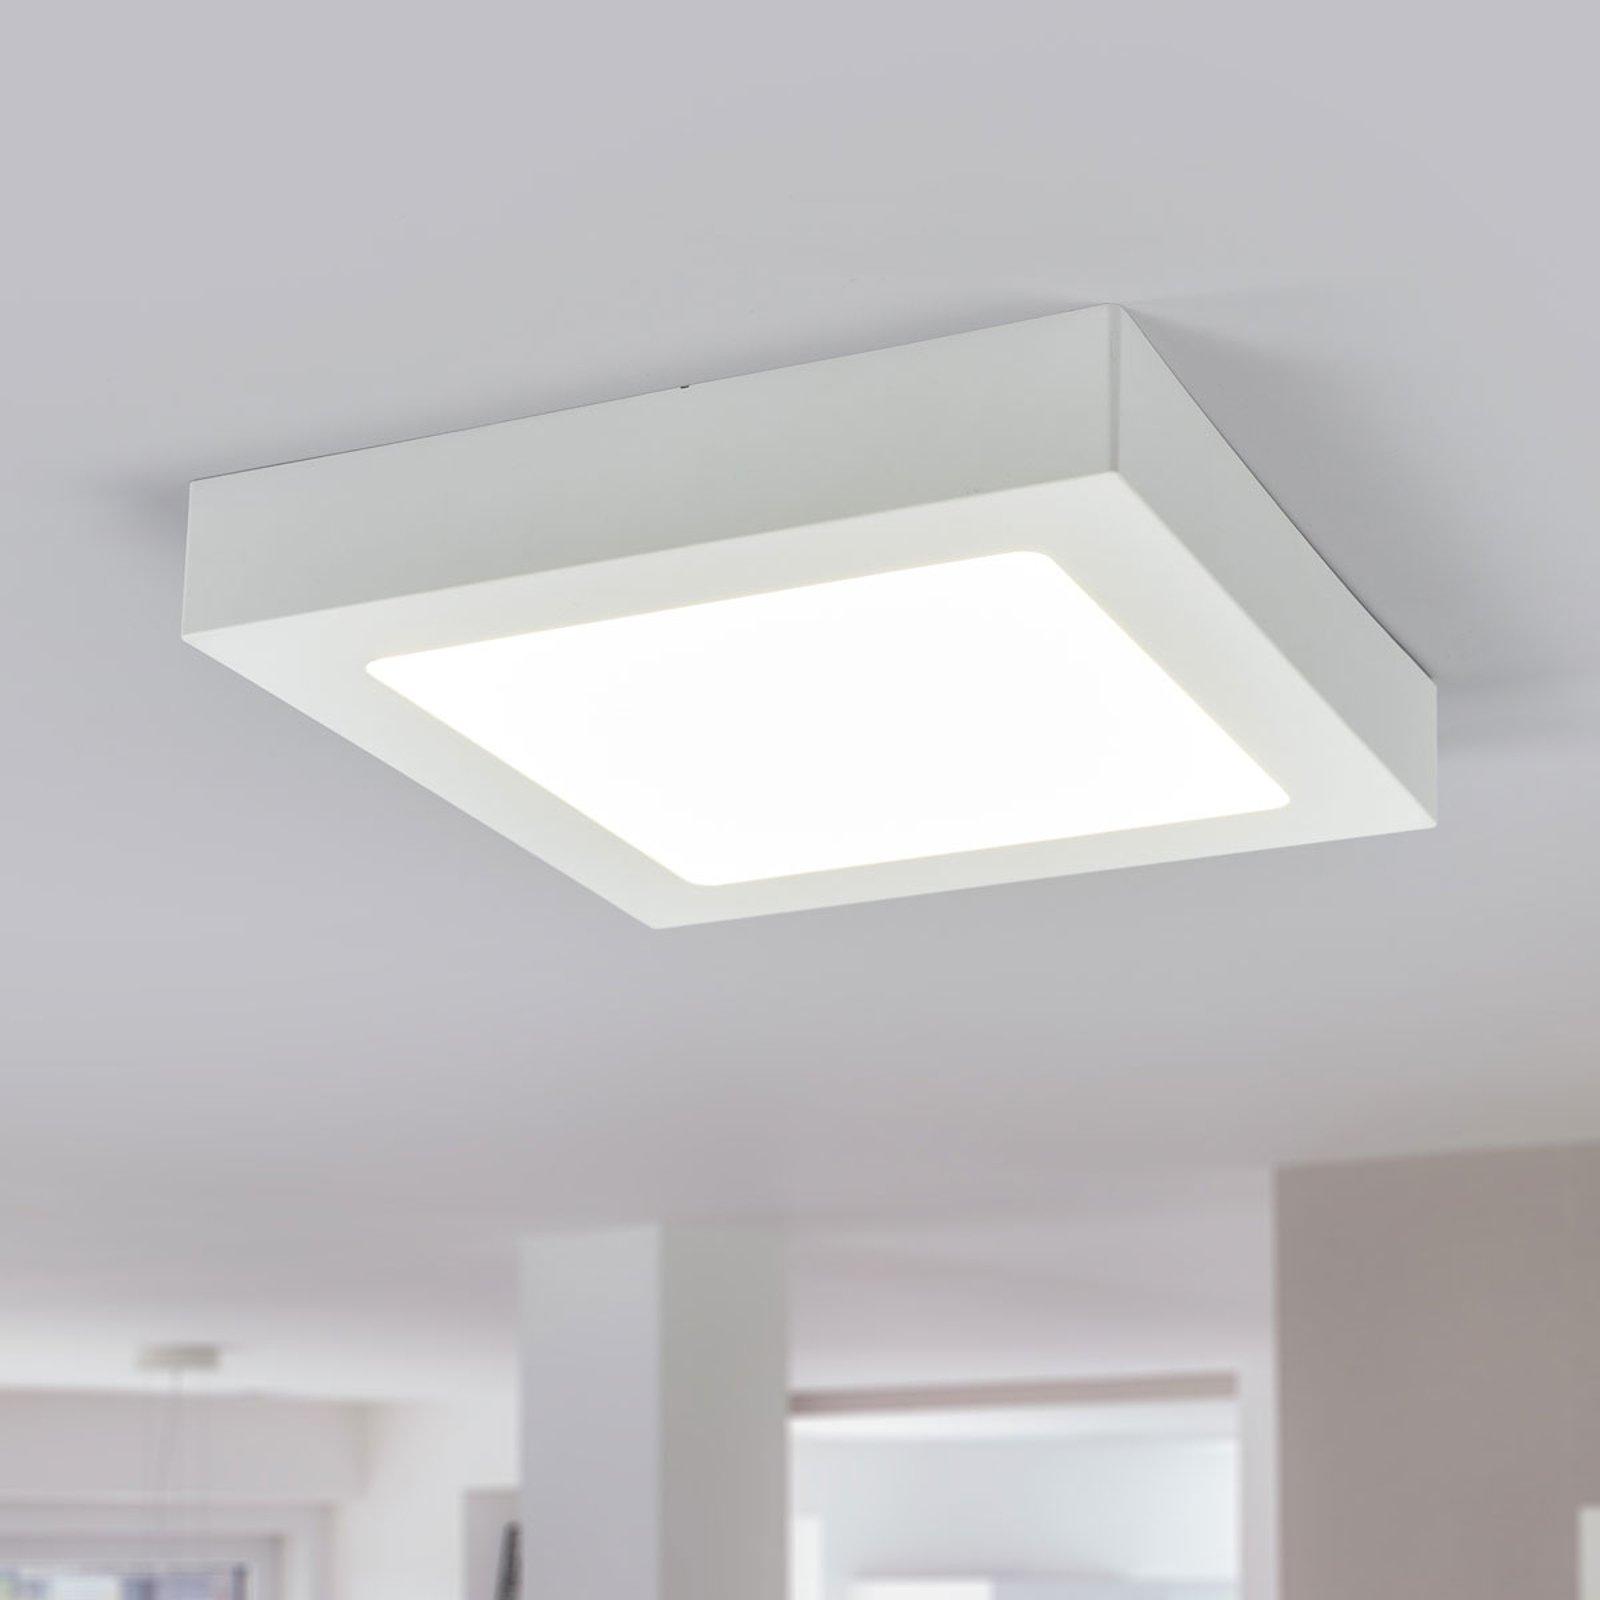 LED-taklampe Marlo, hvit, 4 000 K kantet 23,1 cm